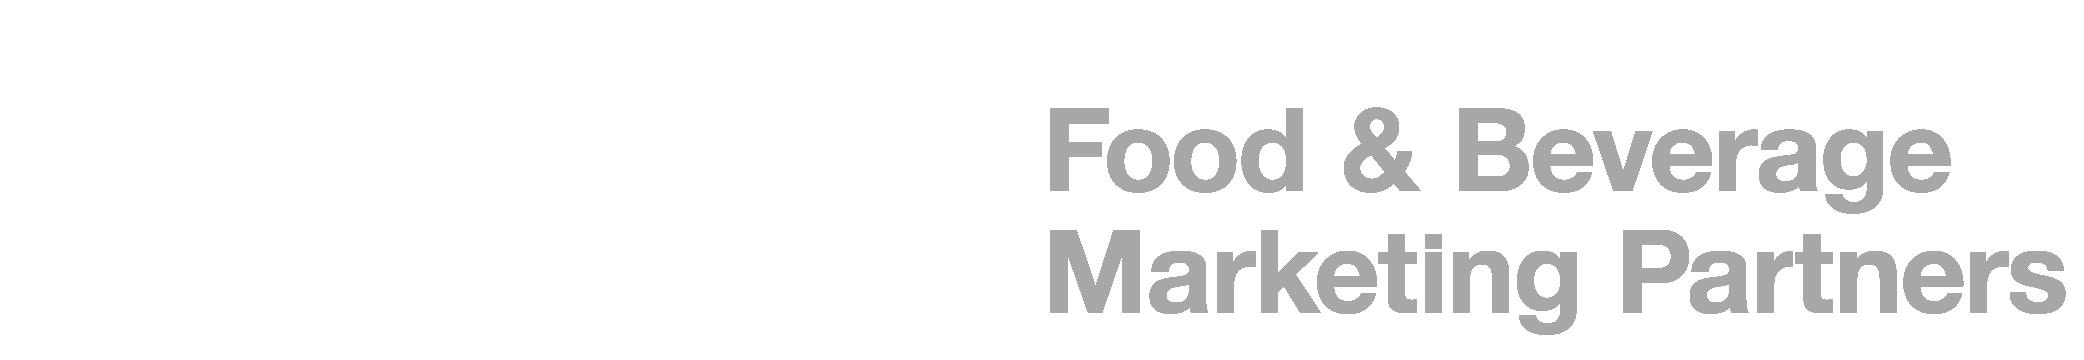 Crew Marketing Partners logo